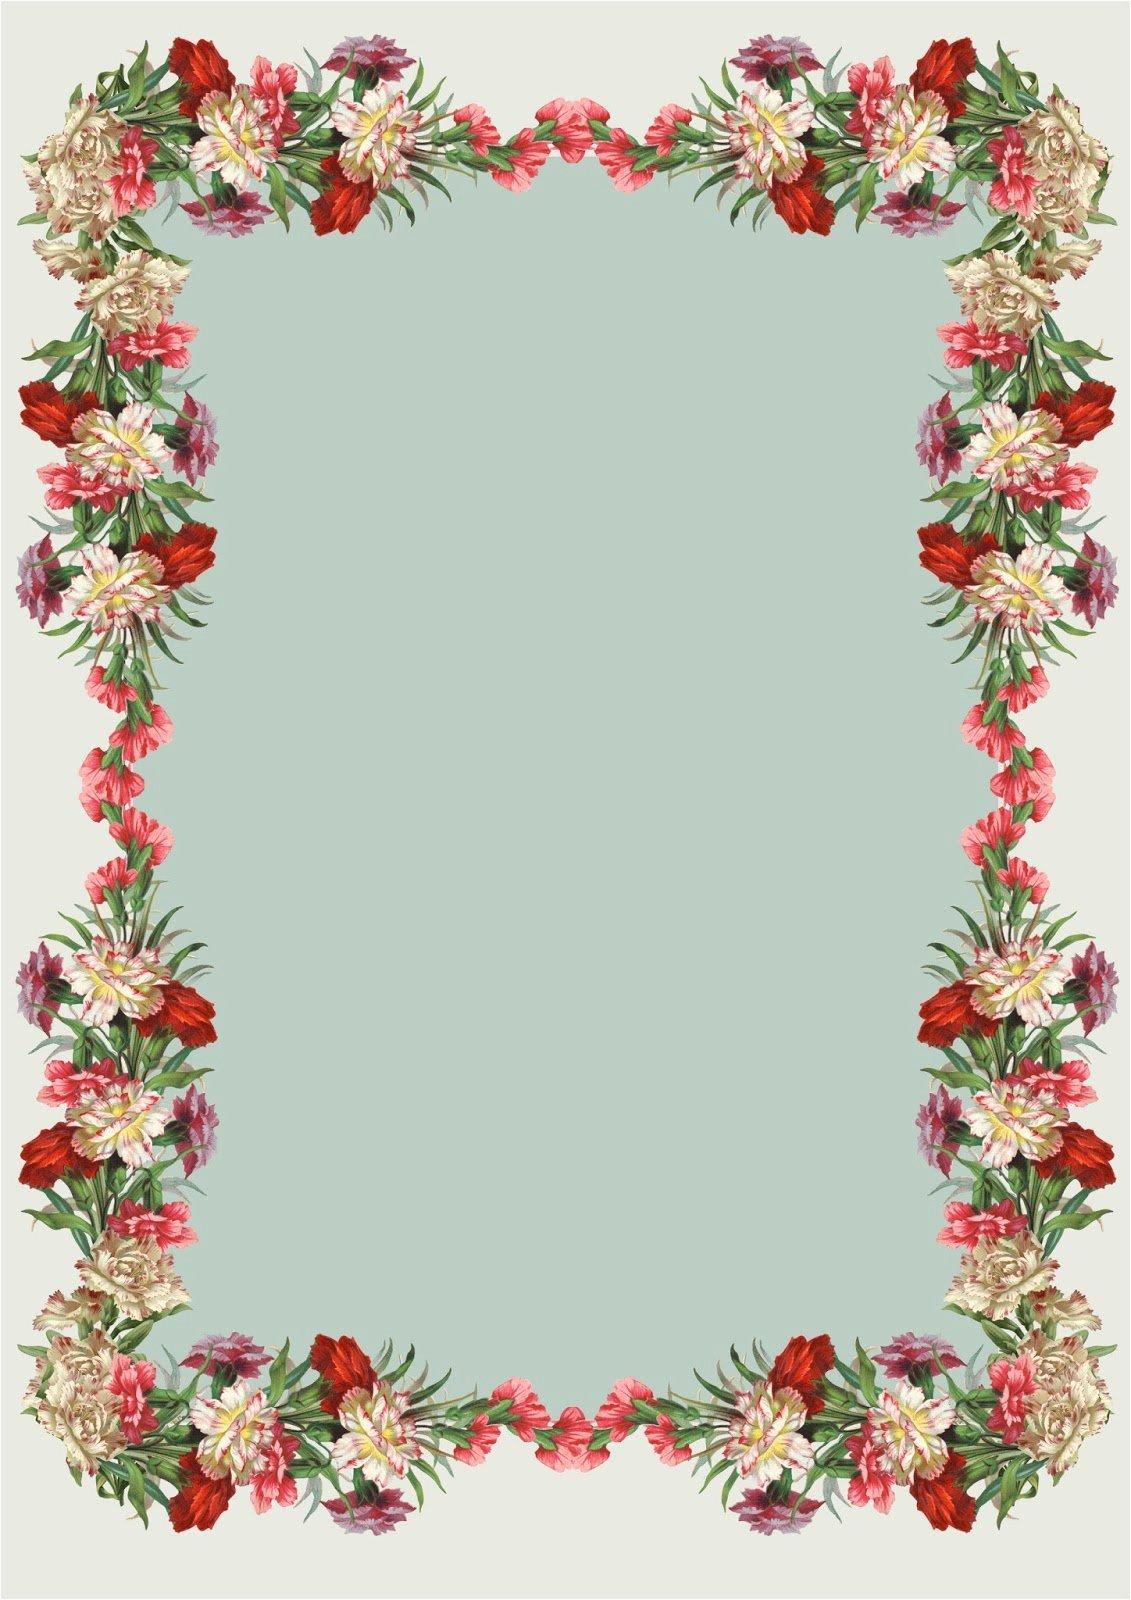 Floral Stationery Template Free Luxury Free Printable Vintage Flower Stationery Ausdruckbares